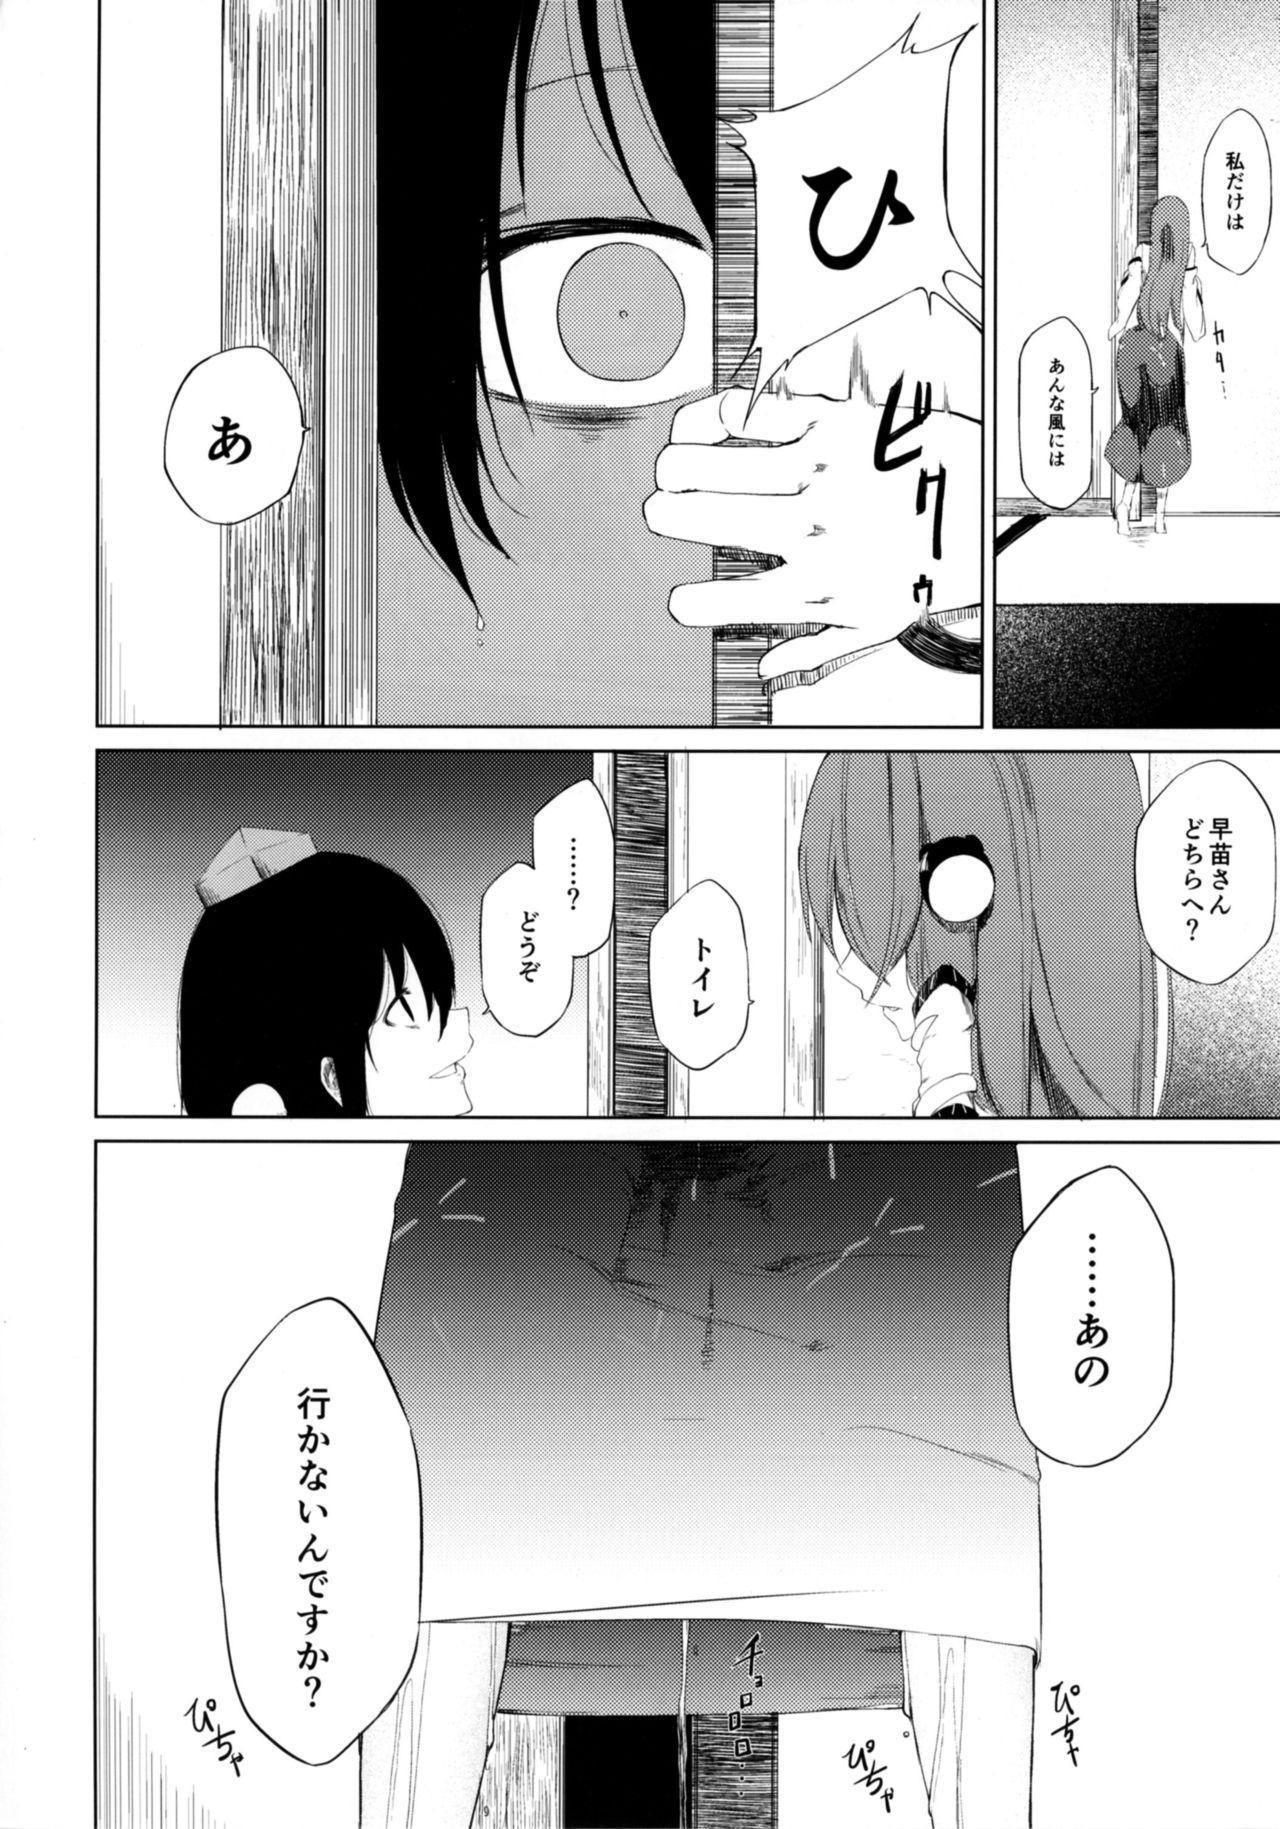 Aya to Tewi to Sanae to Udonge ga Omorashi Suru Hon!! 23